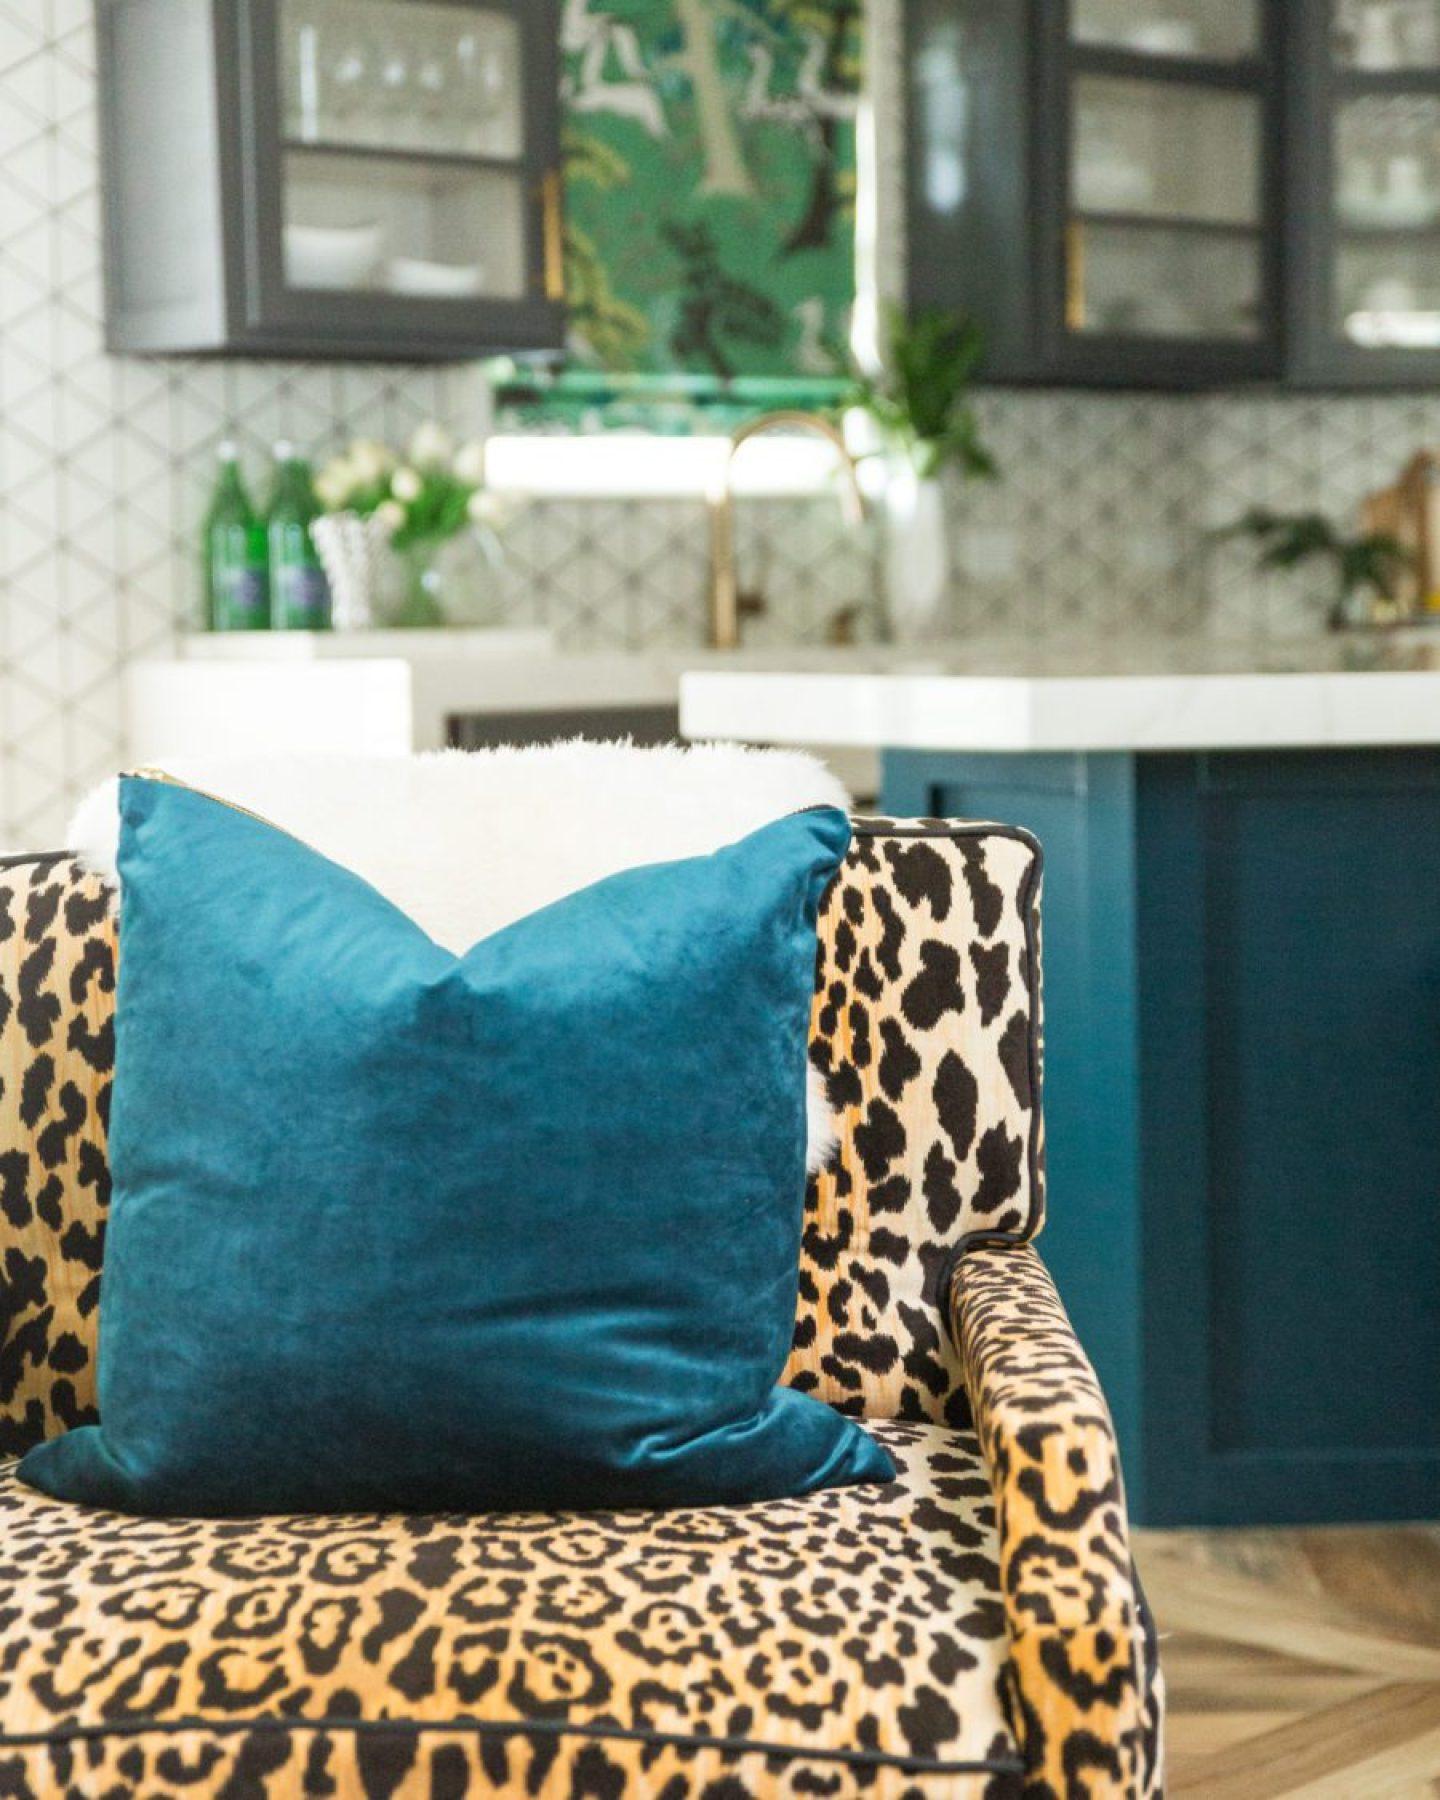 Veronica-Solomon-9.5.18-32-of-119-1440x1800 Maximalist Decor Inspiration from Texas Designer, Veronica Solomon